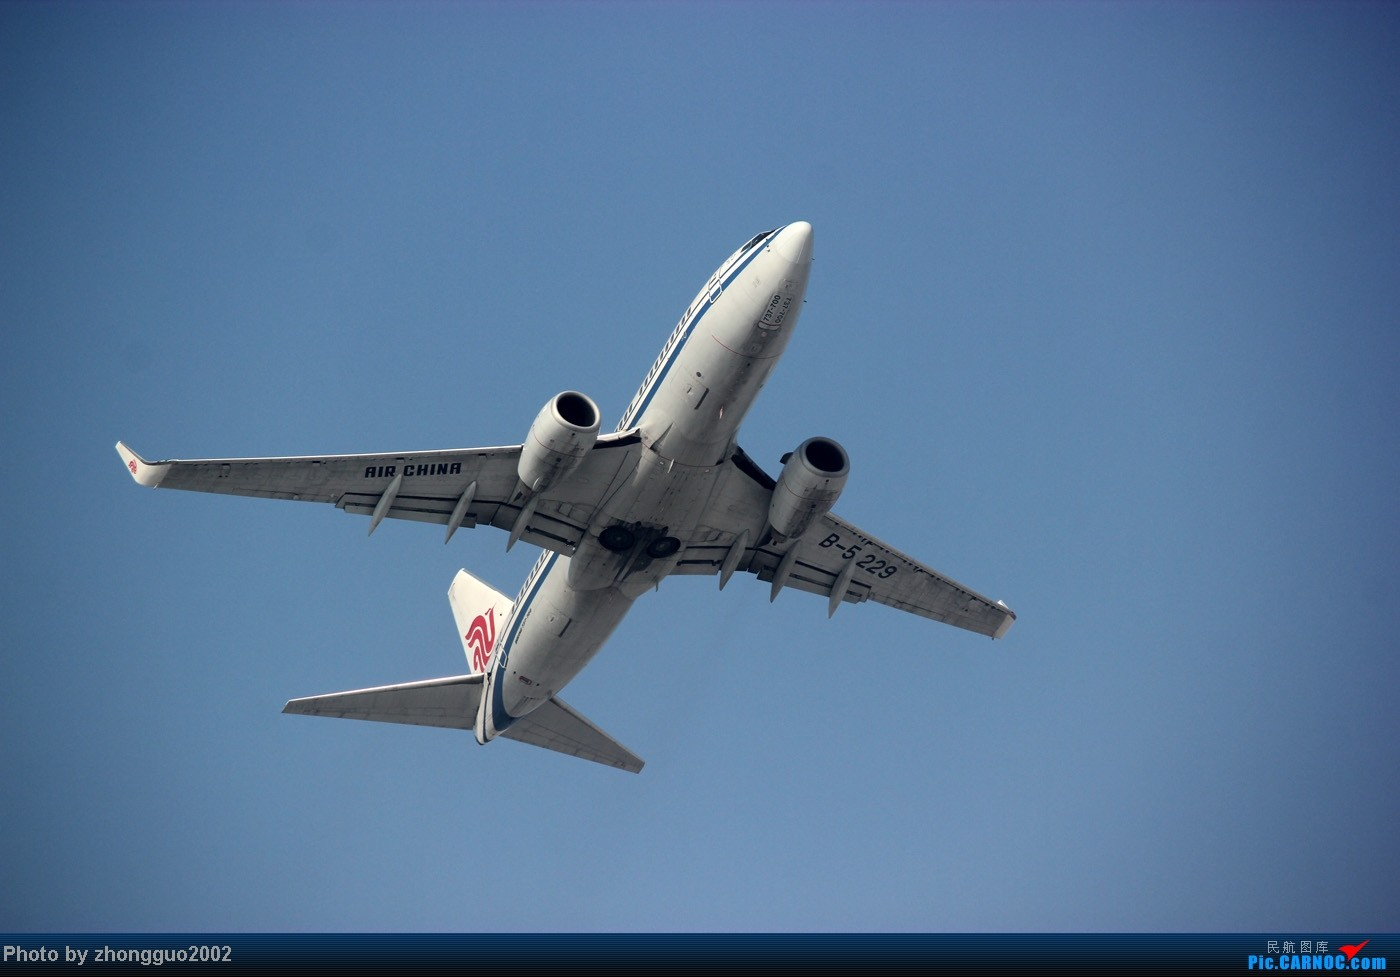 Re:[原创]随着2012年的最后一场雪的到了,我的2012年拍机工作也圆满的结束了,把这段时间里灰机整理一下,把没发的,我个人认为好的发上来! BOEING 737-700 B-5229 中国包头二里半机场